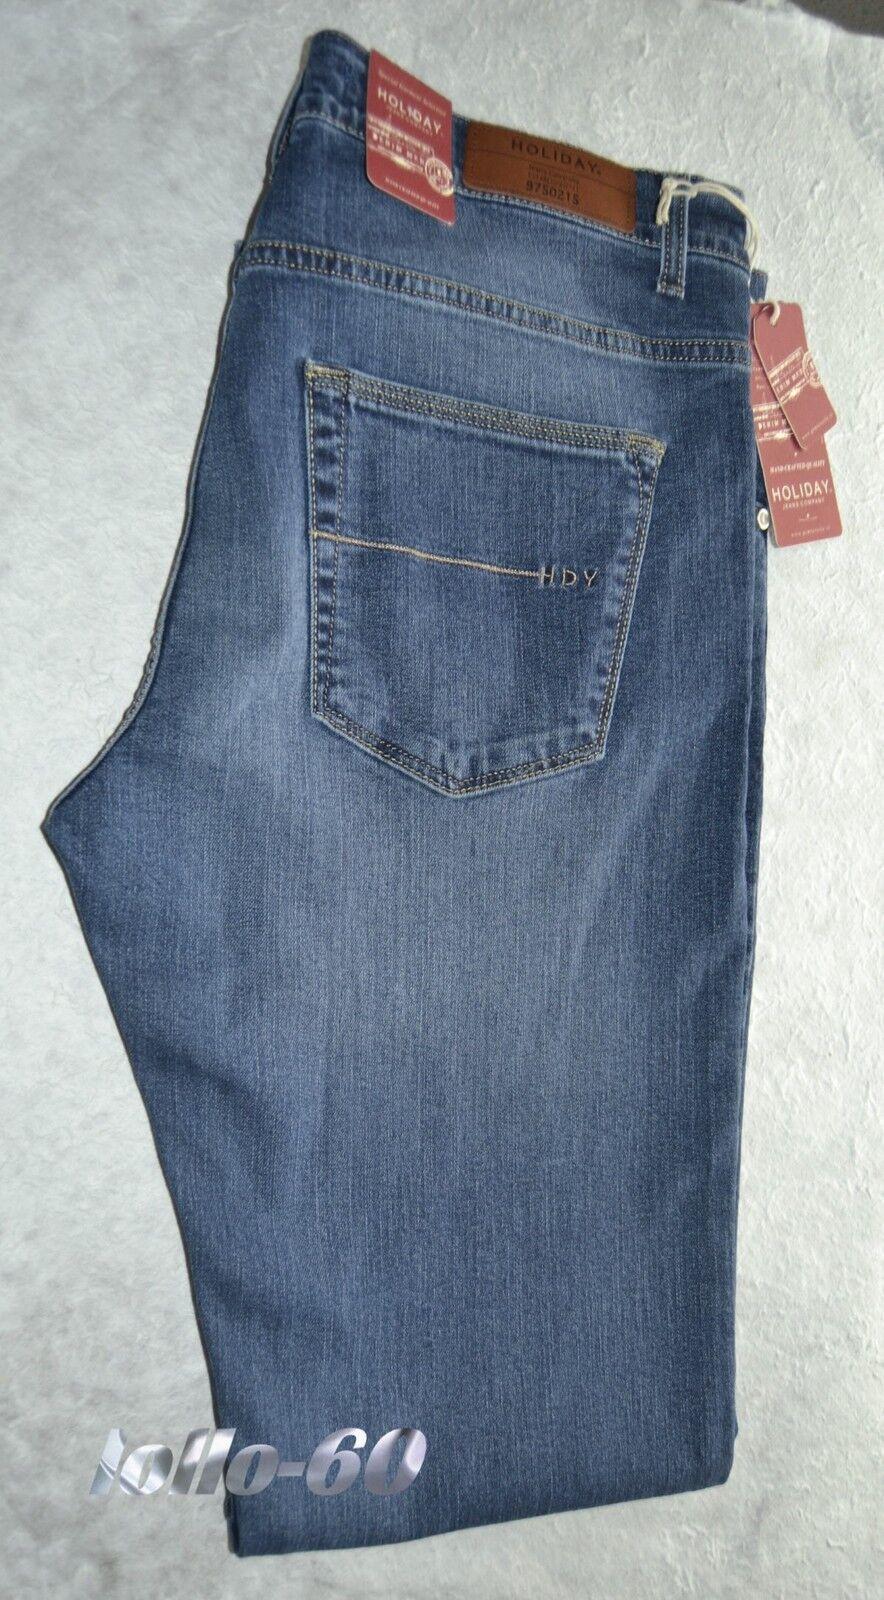 Jeans uomo Taglia 58 HOLIDAY pantalone elasticizzato elasticizzato elasticizzato blu delavè MADE IN ITALY c882ef